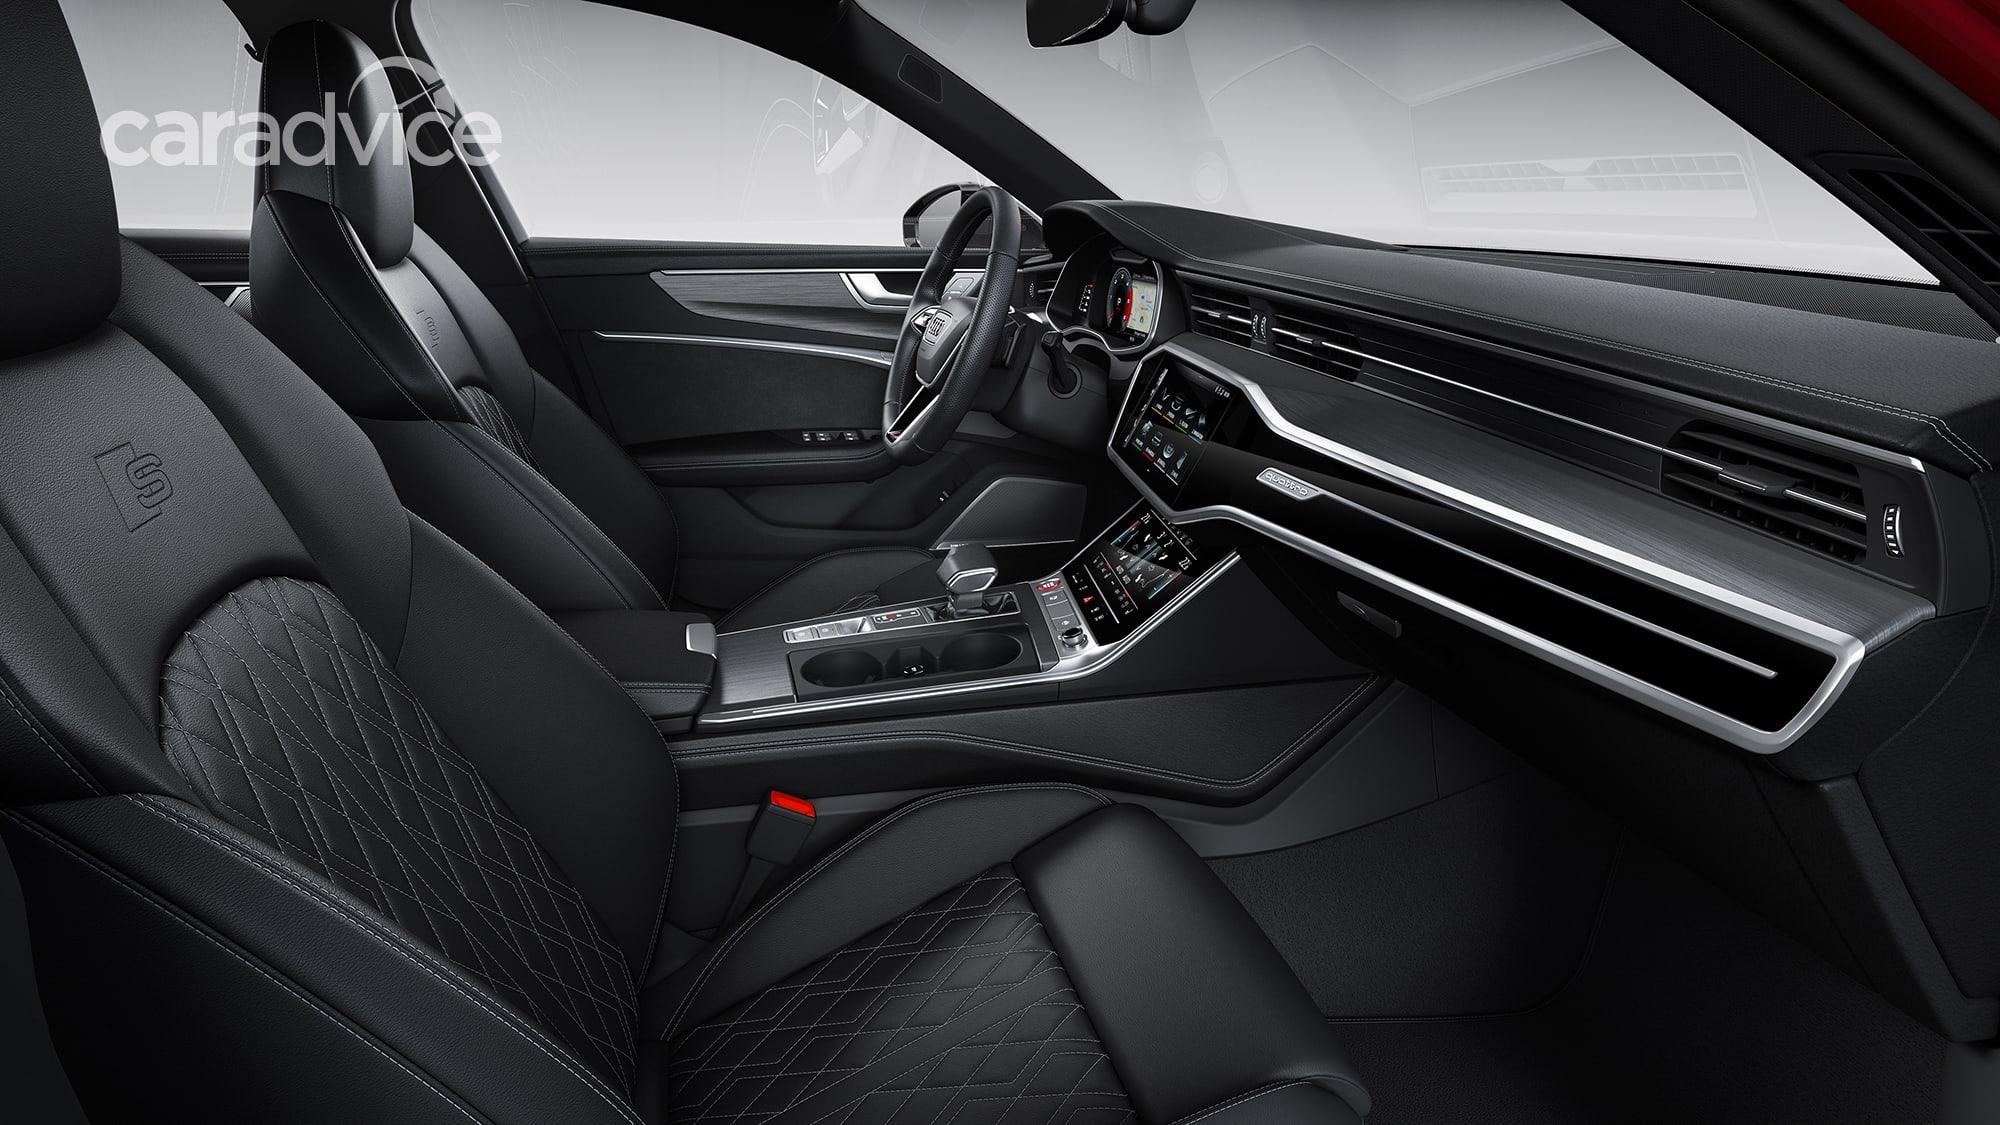 2017 - [Audi] A6 Berline & Avant [C8] - Page 11 Lh4y7glrkl8uliksousx